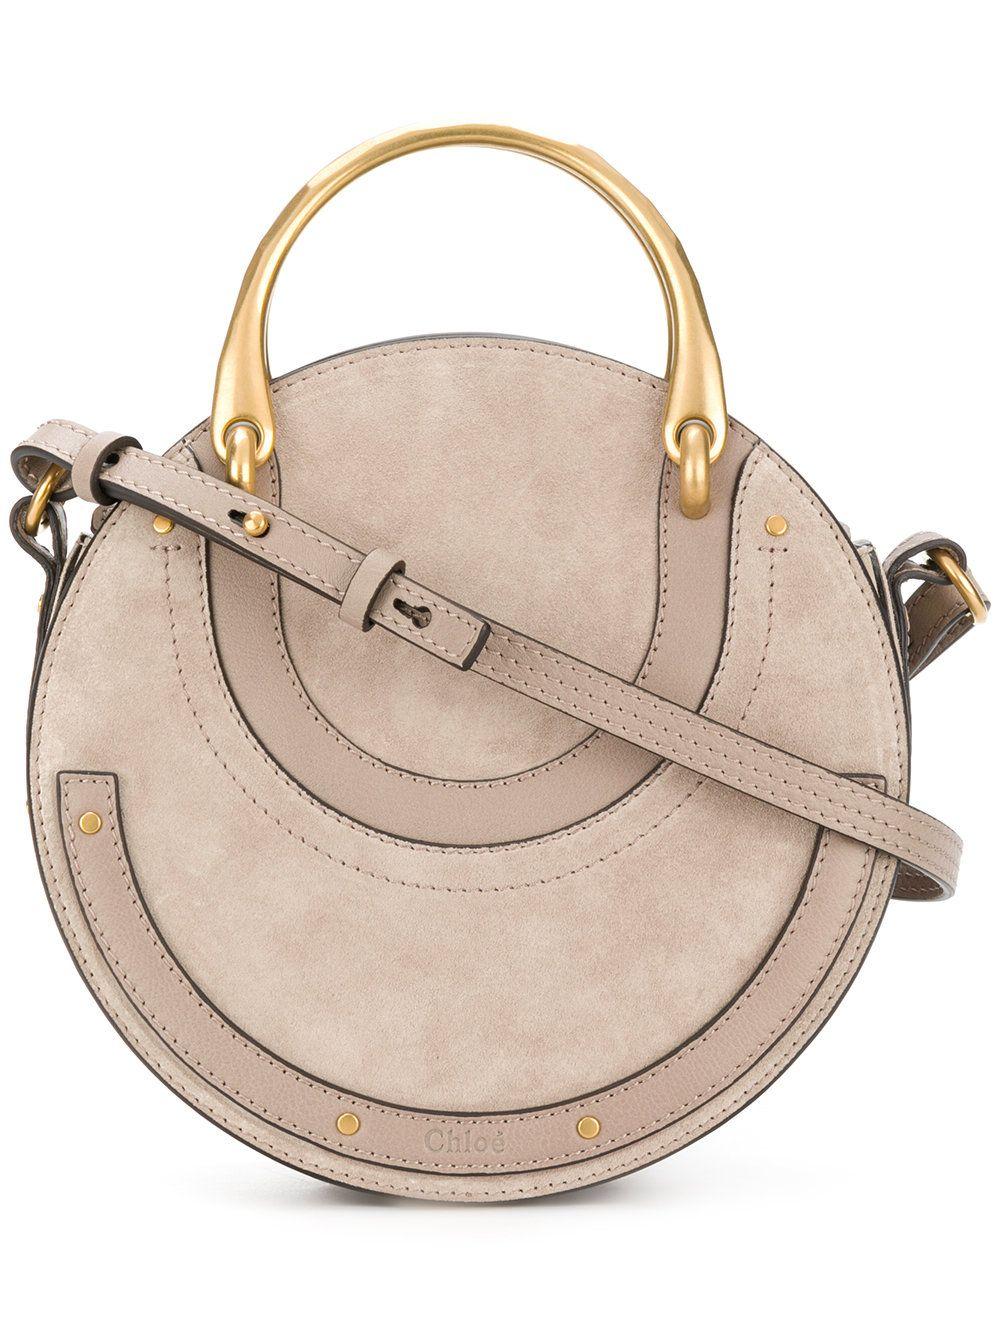 small Pixie bag - Nude & Neutrals Chlo jOenu